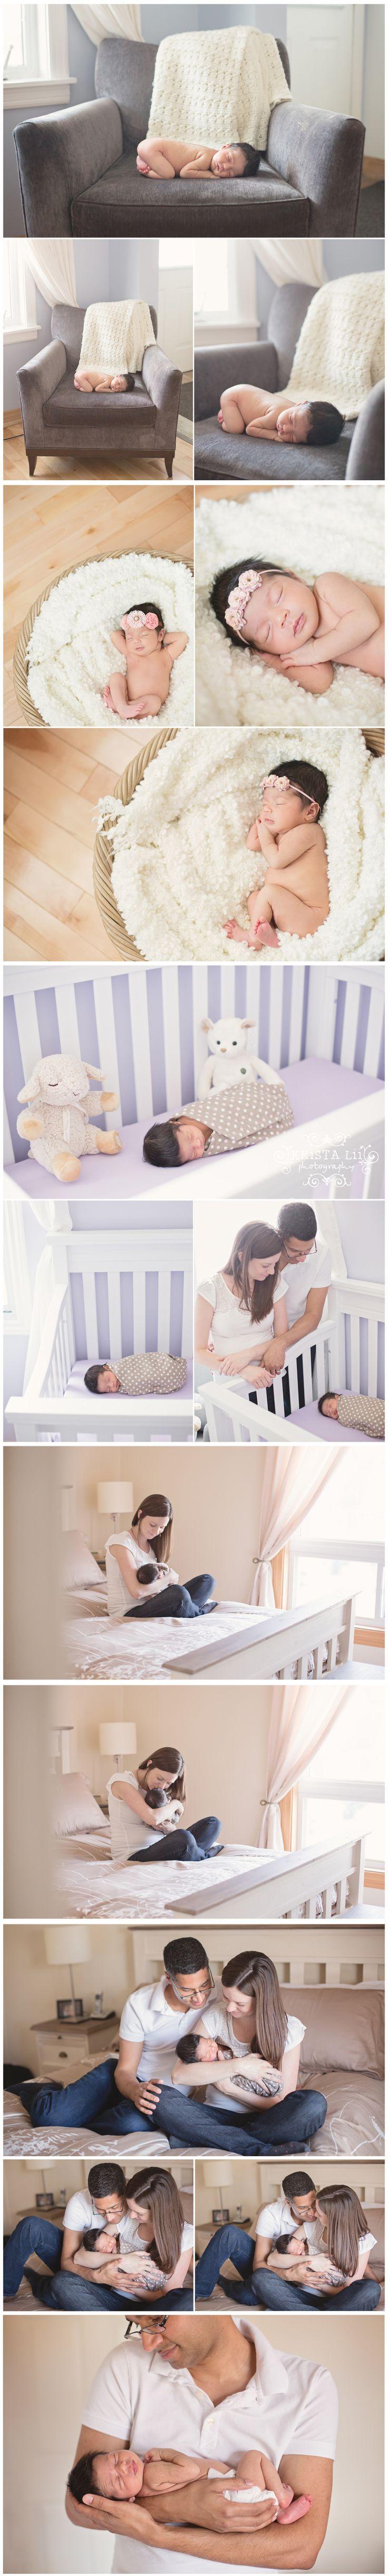 Lifestyle Newborn Photography by Krista Lii | Toronto Newborn Photographer @Jason Stocks-Young Stocks-Young McPheron eun smalls